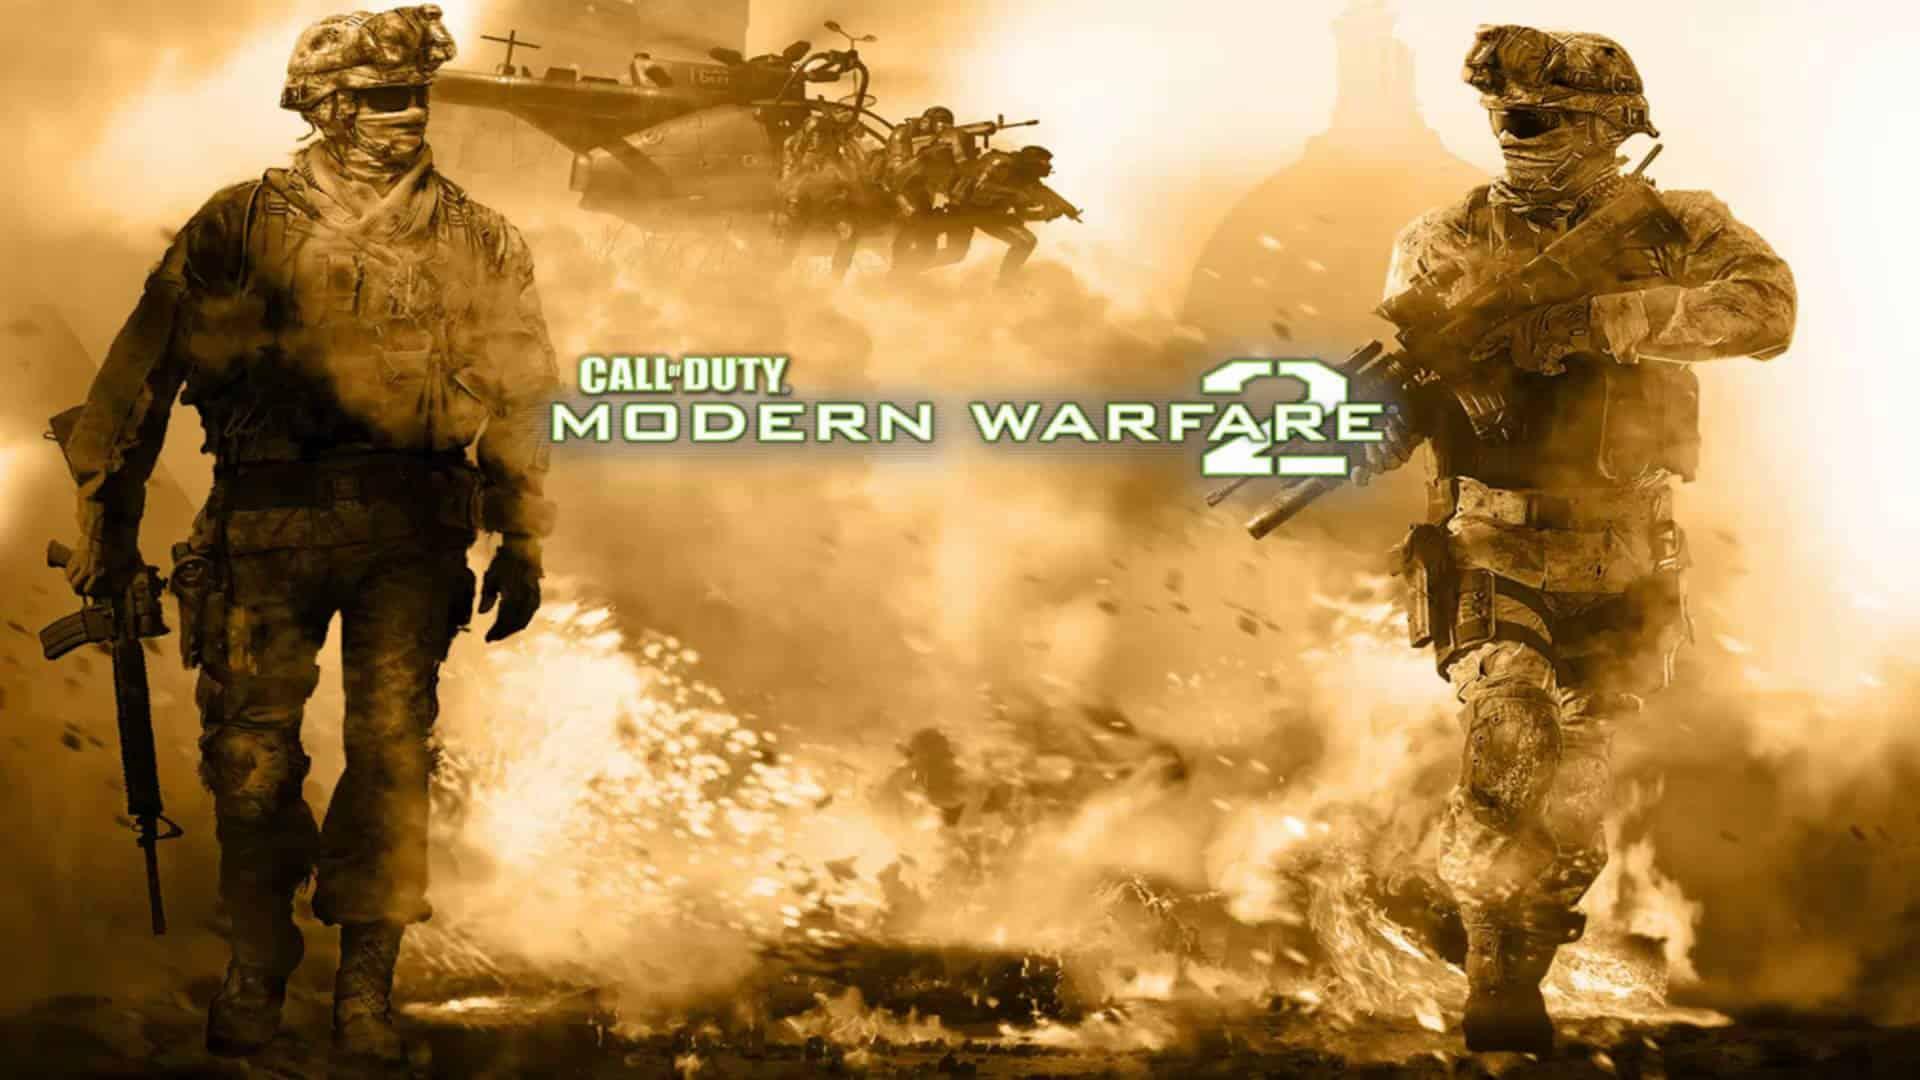 Best Call of Duty Games - Call of Duty Modern Warfare 2